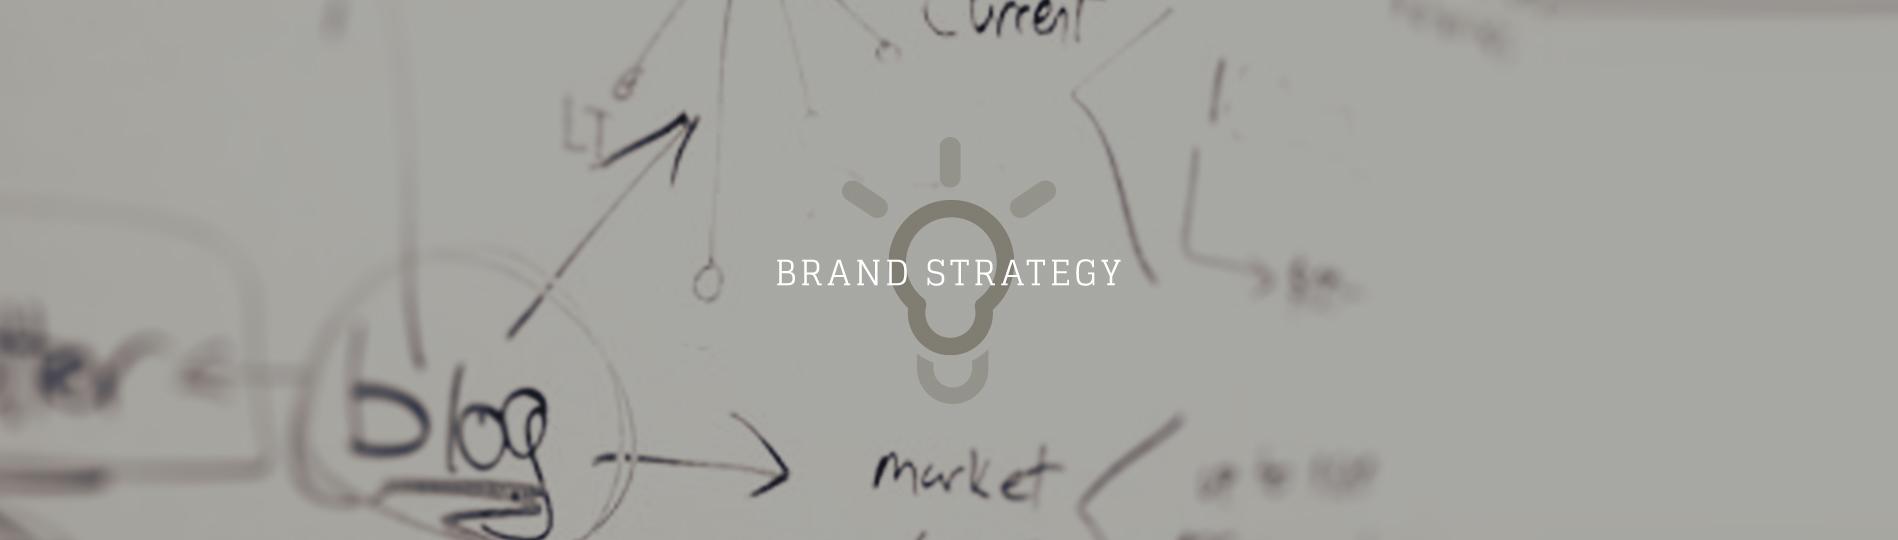 Capabilities_Brand-Strategy.jpg